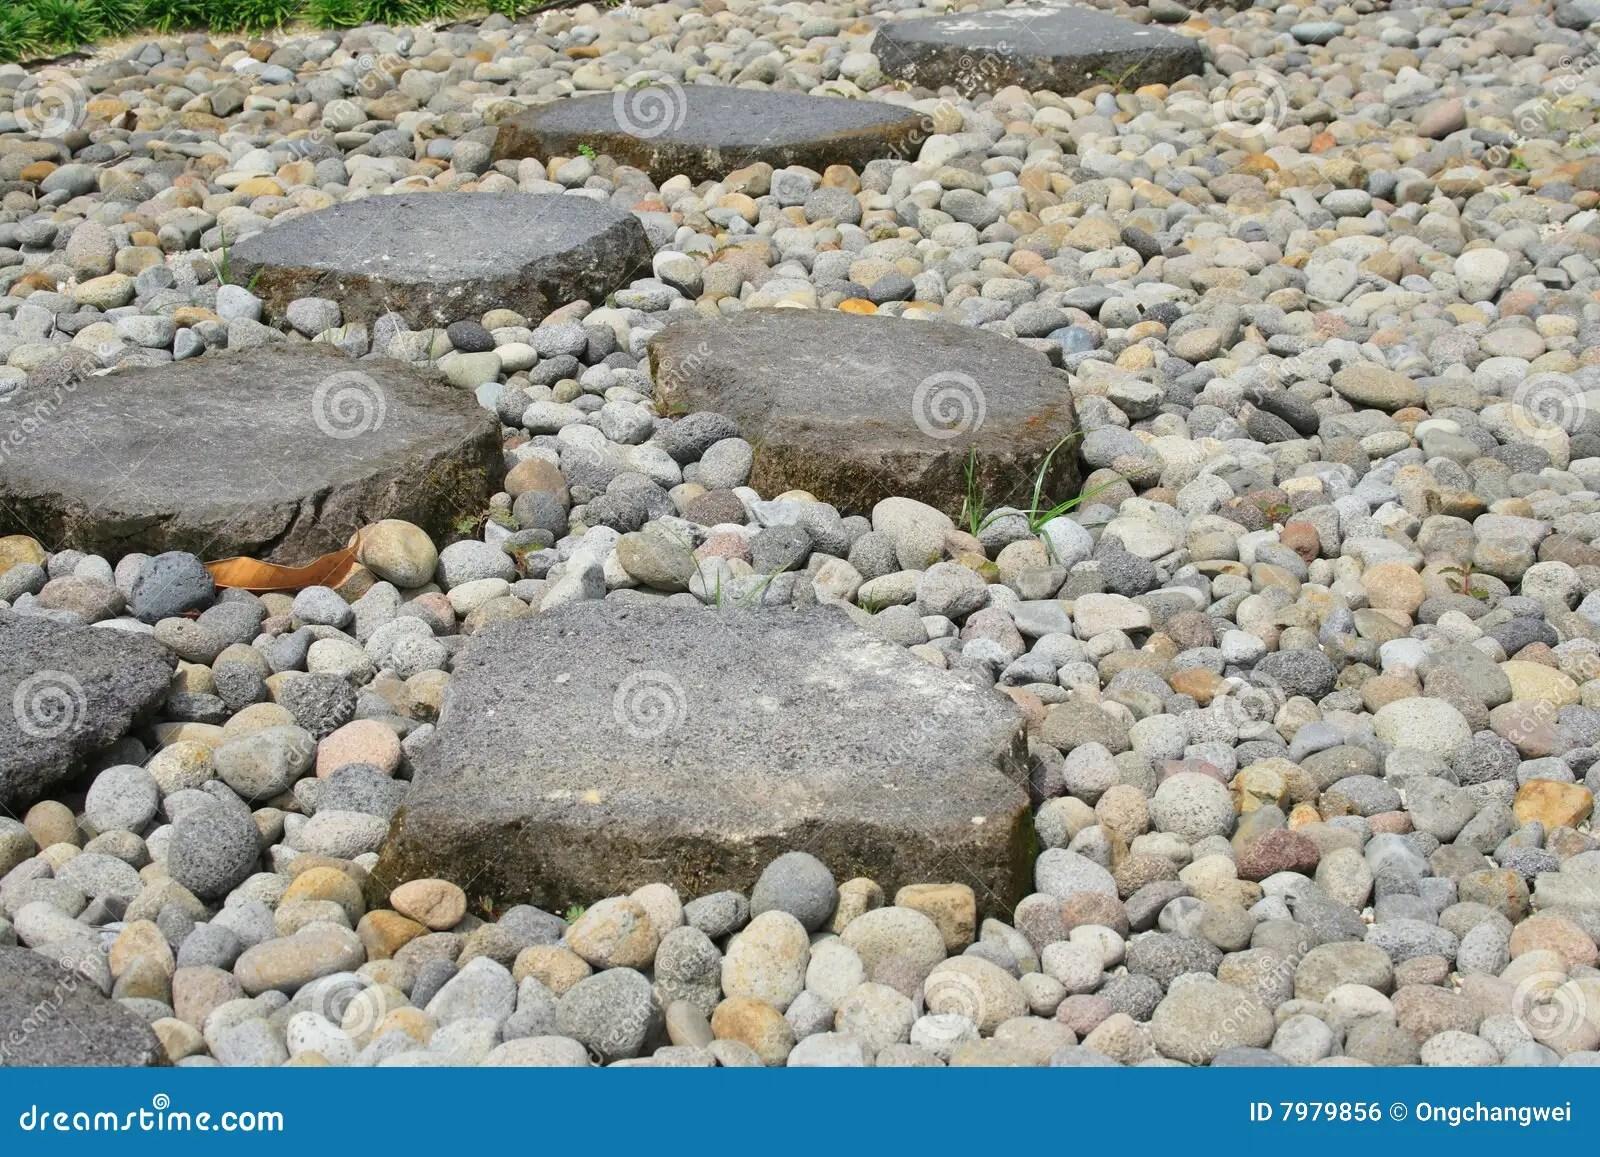 garden stone path stock